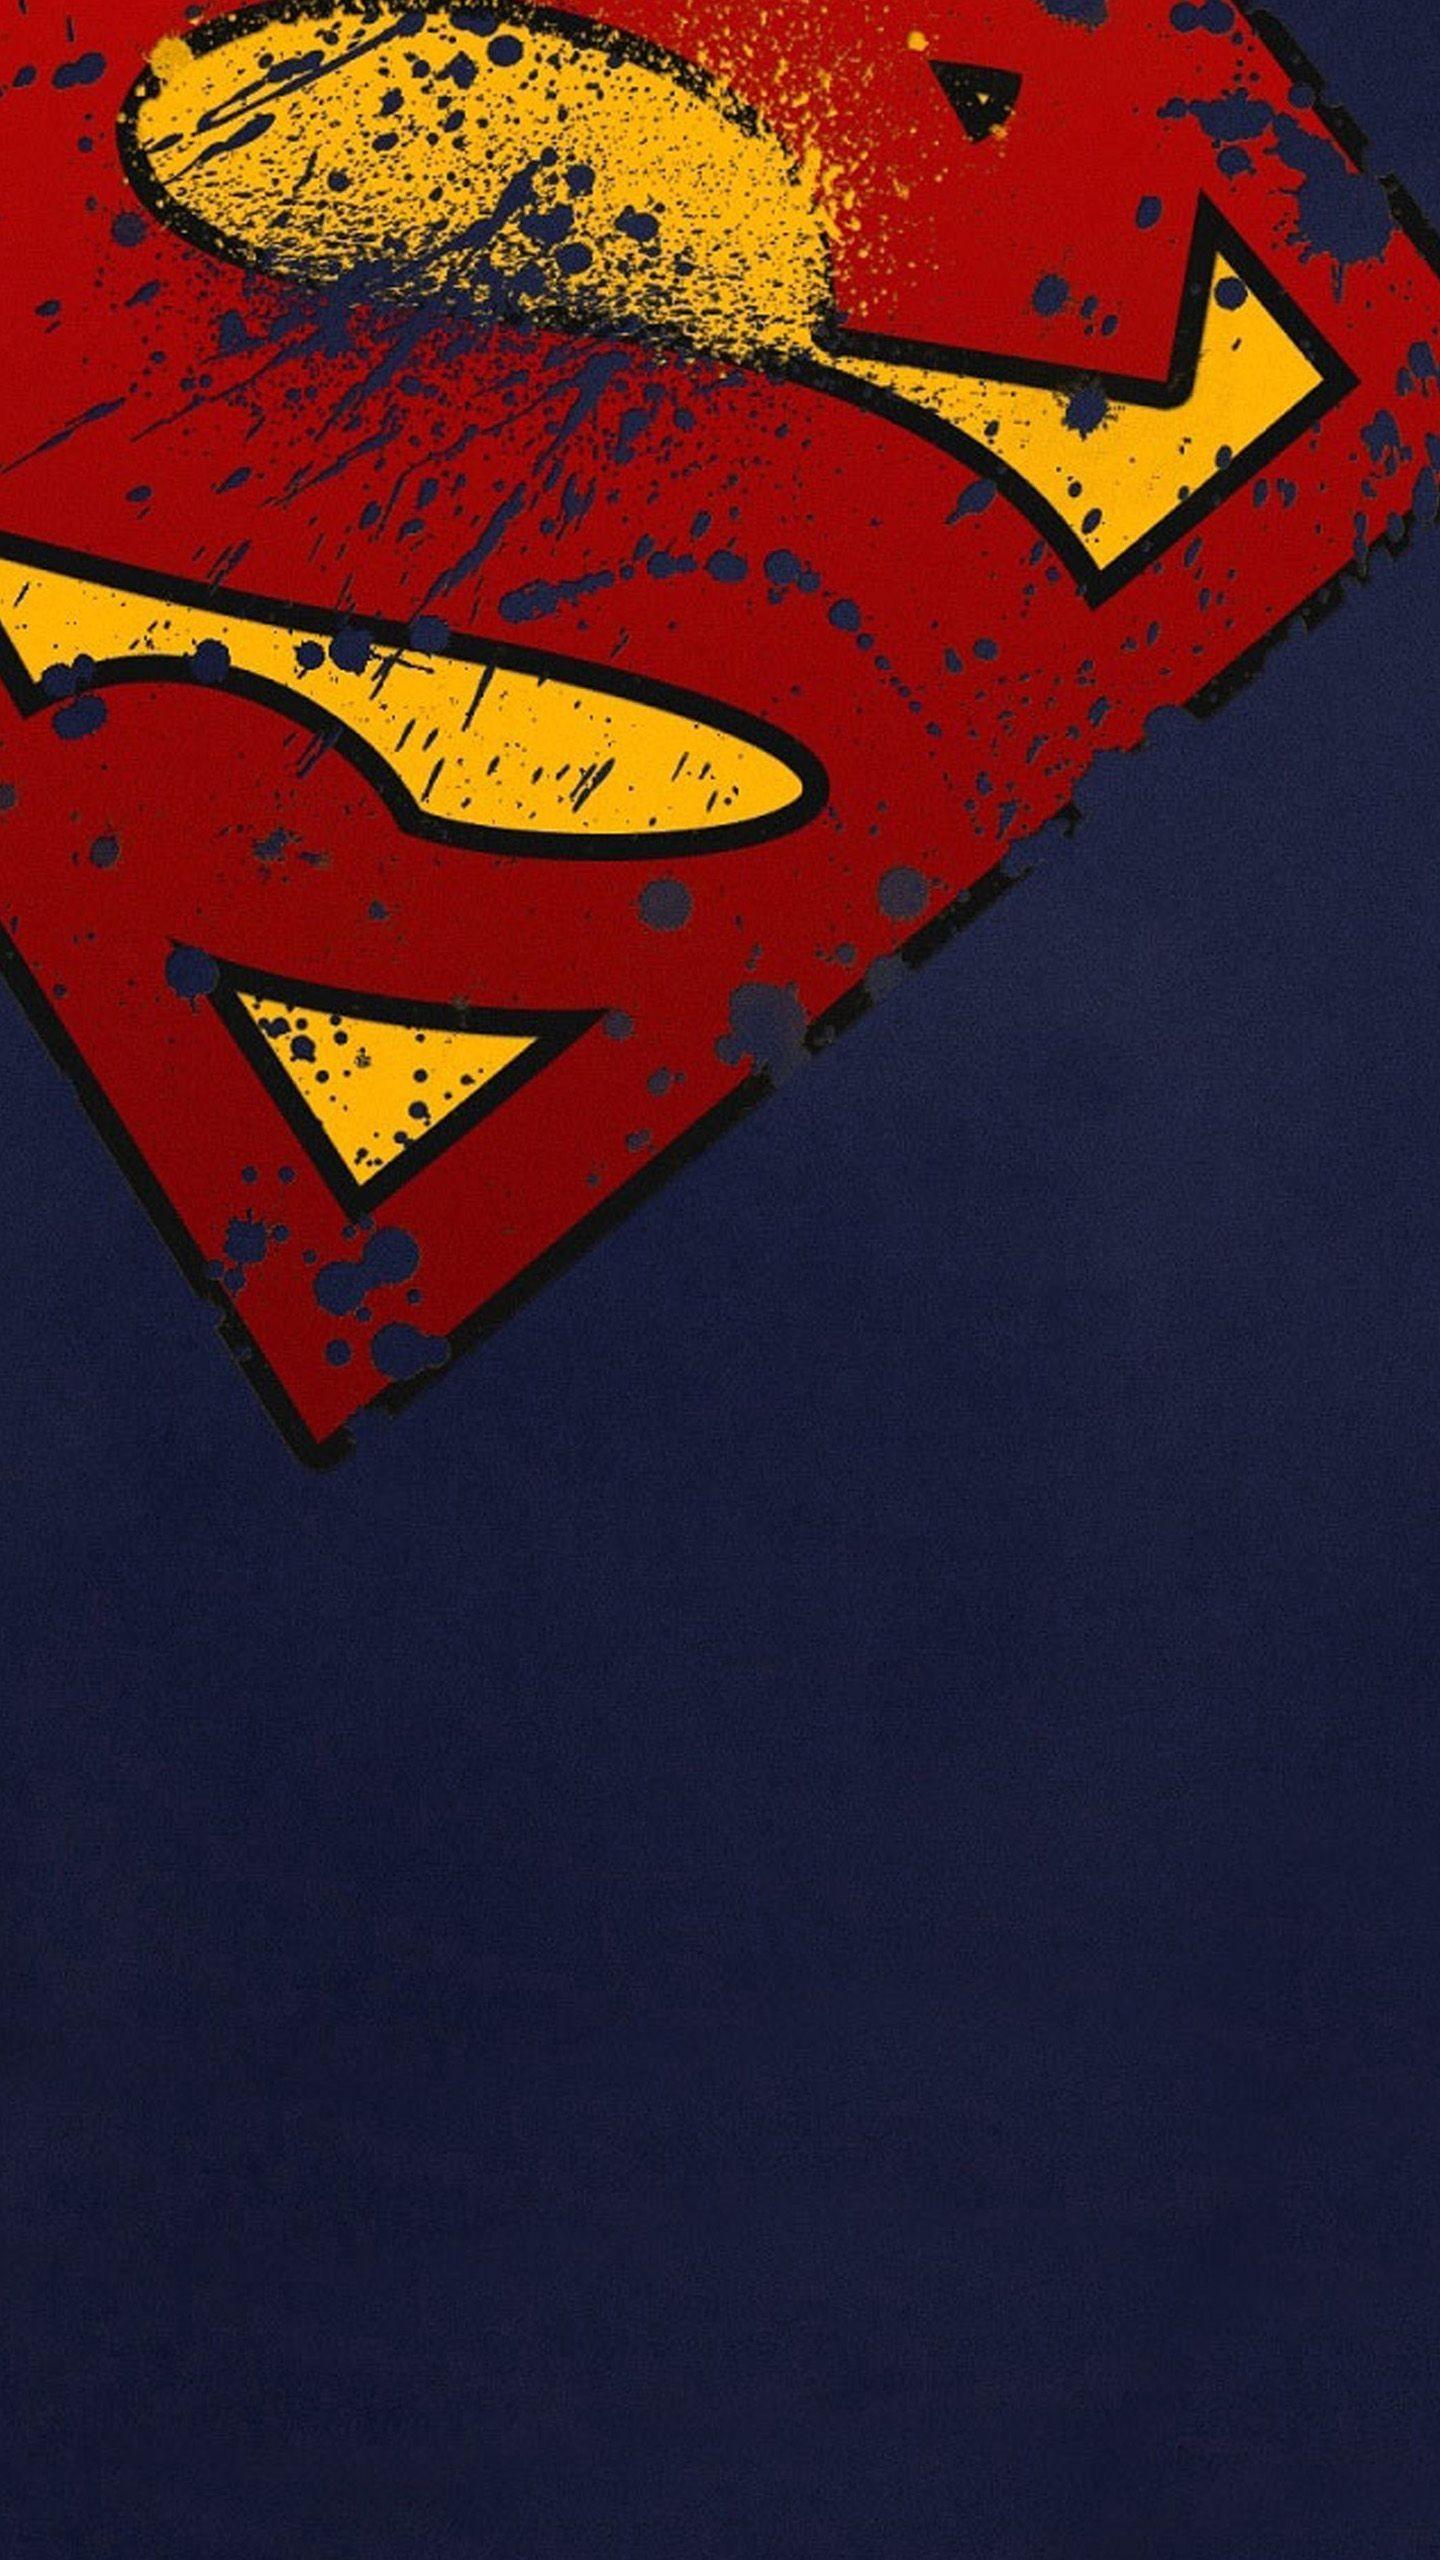 Download Superman Logo Images Mobile Phone Wallpapers Full HD .